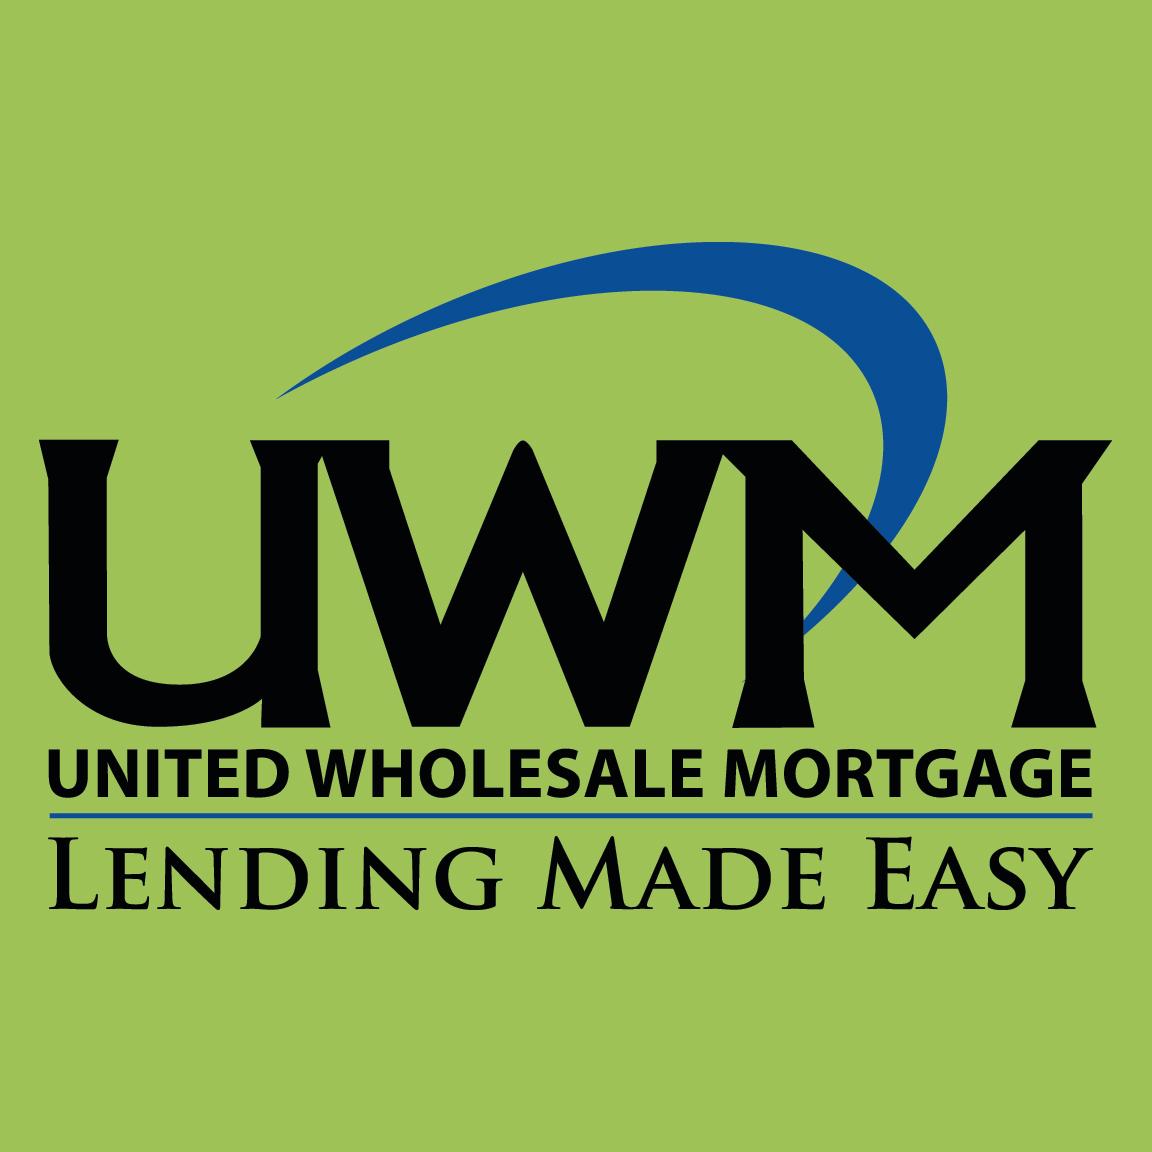 United Wholesale Mortgage